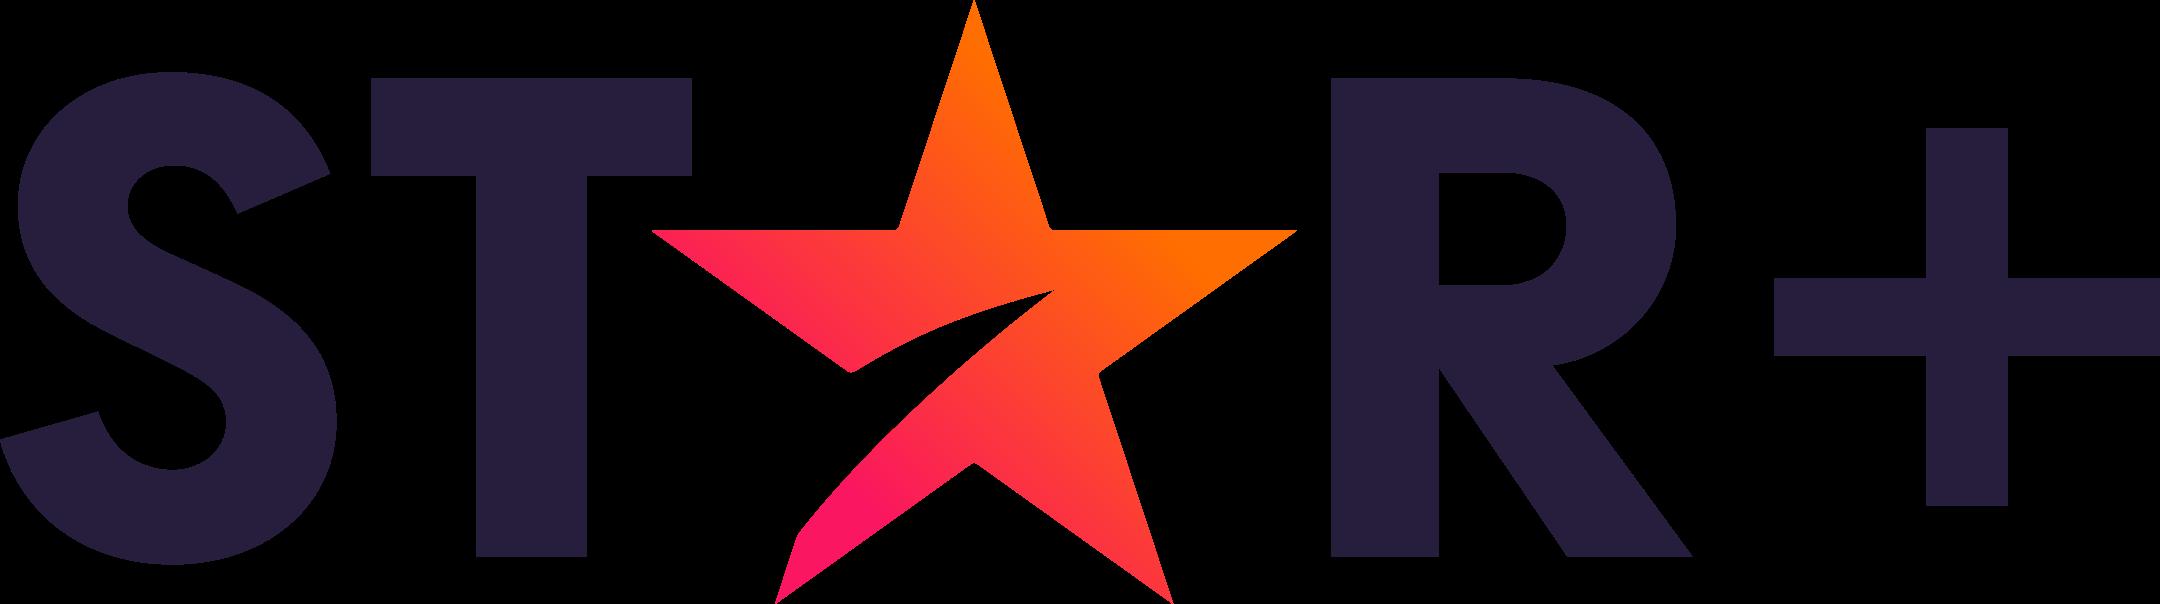 star plus logo 1 - Star+ Logo